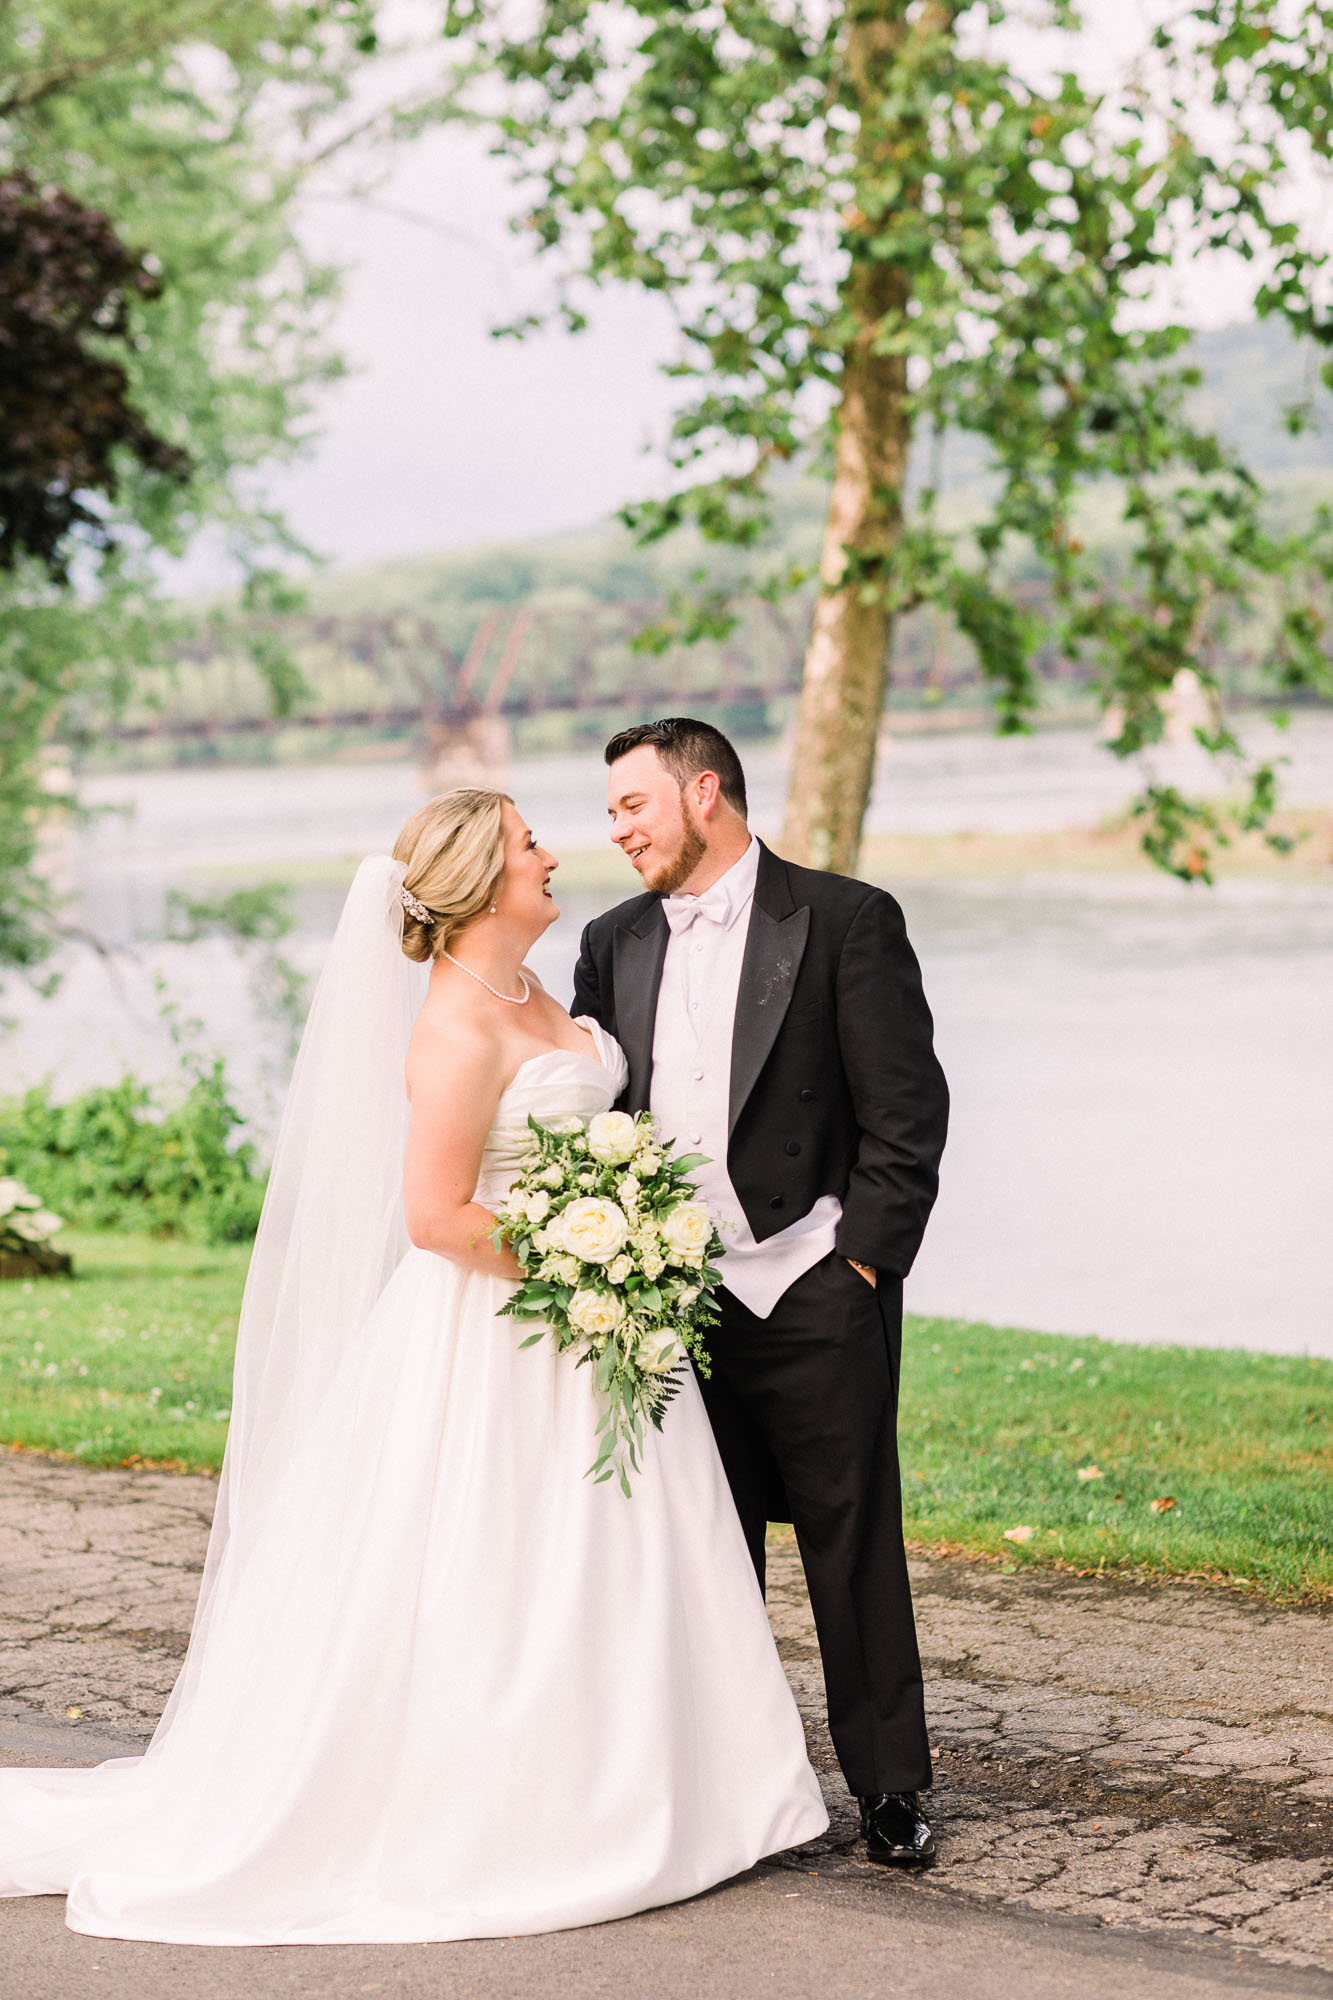 isle-of-que-wedding-4084.jpg